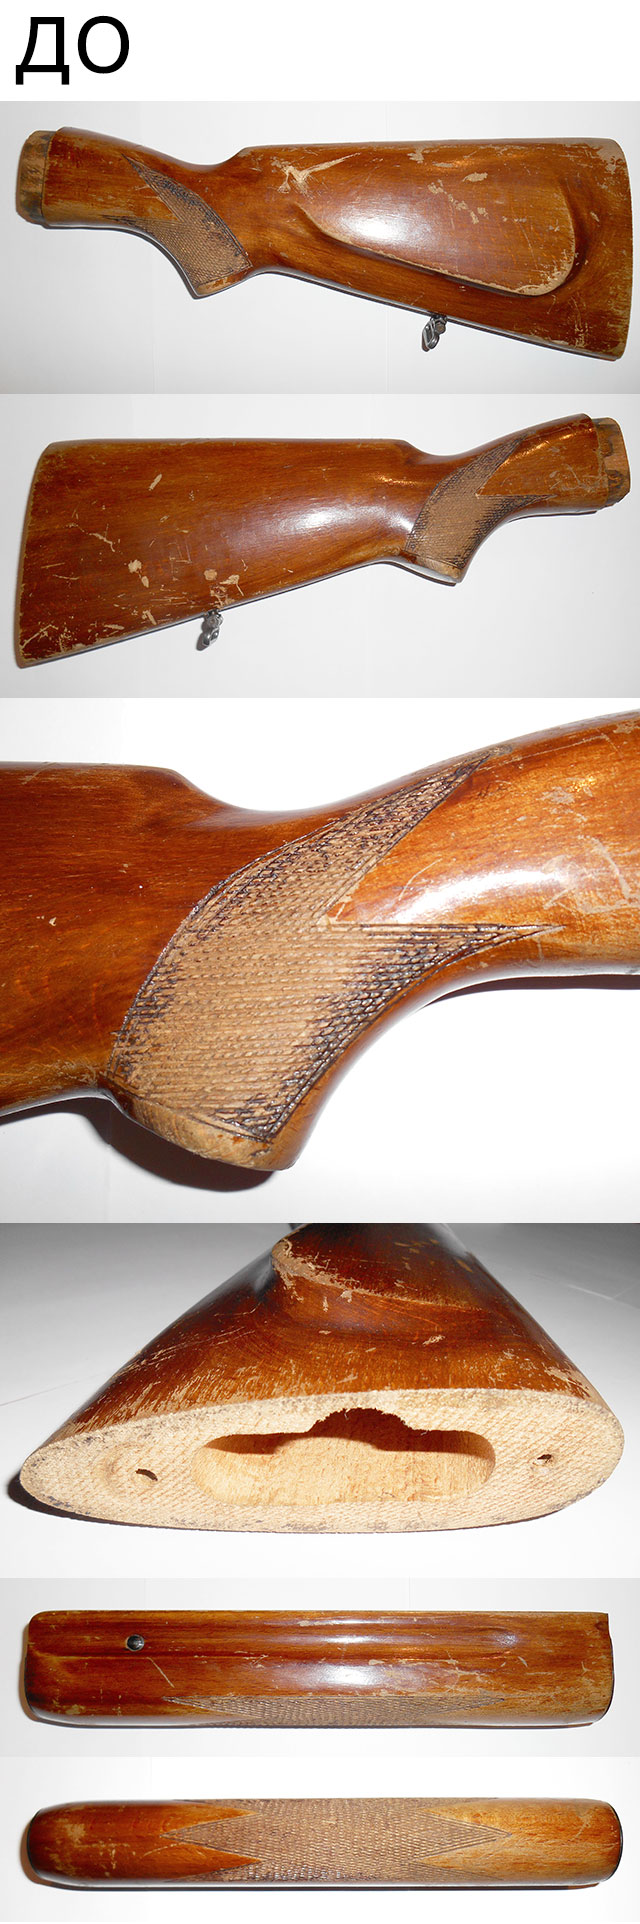 Приклад и цевье ружья МЦ 21-12 до реставрации